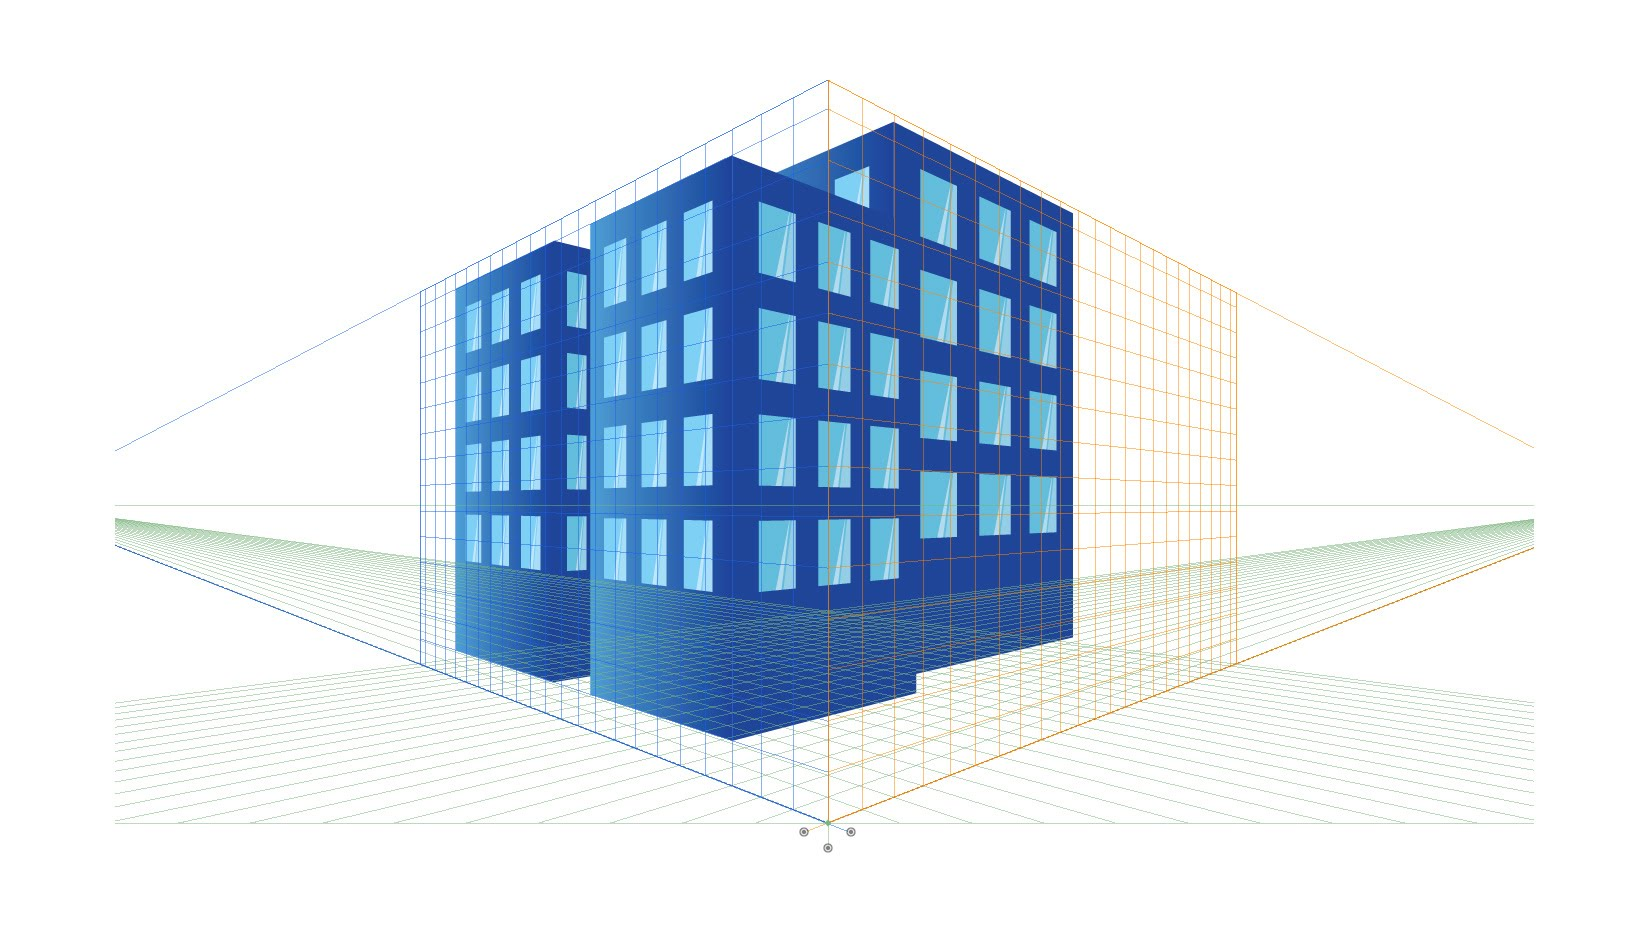 le label bbca entre en vigueur aujourd 39 hui immobilier blogimmobilier blog. Black Bedroom Furniture Sets. Home Design Ideas